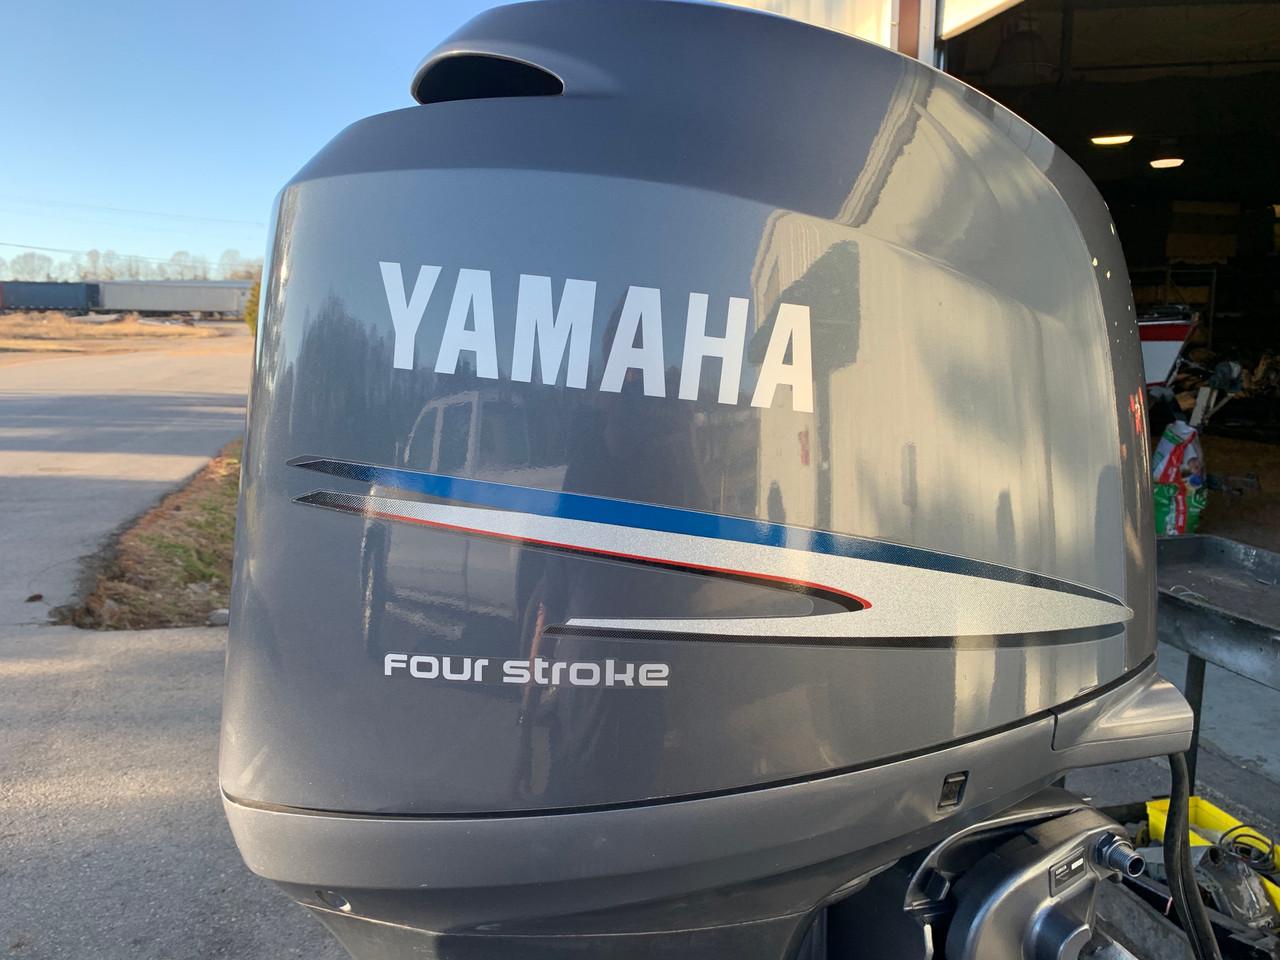 "2004 Yamaha F150 HP 4 Cylinder EFI 4 Stroke 20"" (L) Outboard Motor"